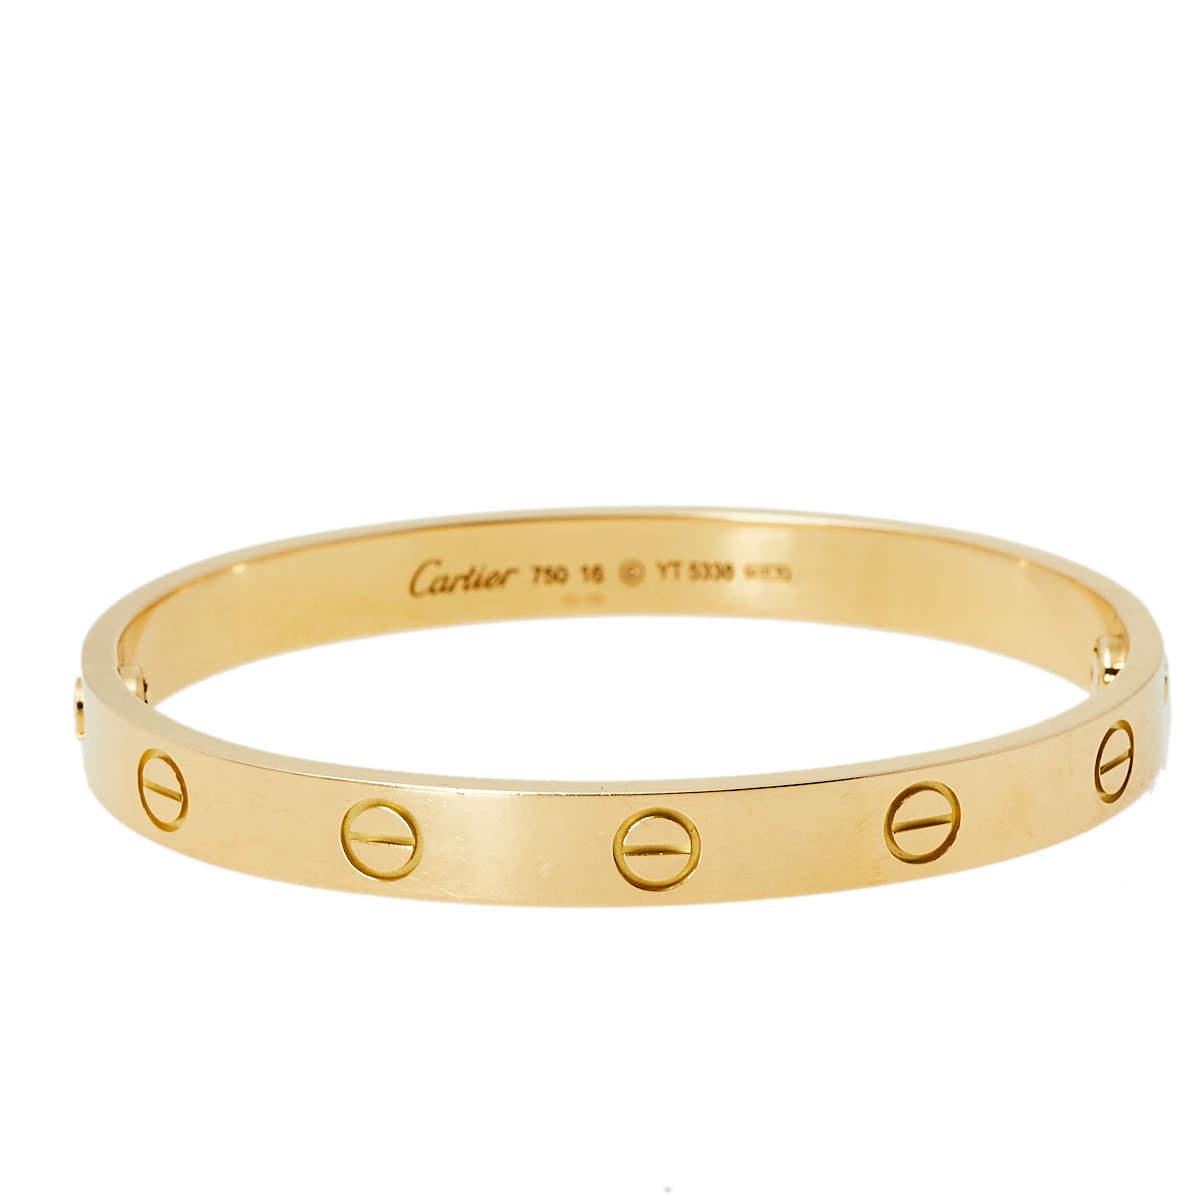 Cartier Love 18K Yellow Gold Bracelet 16